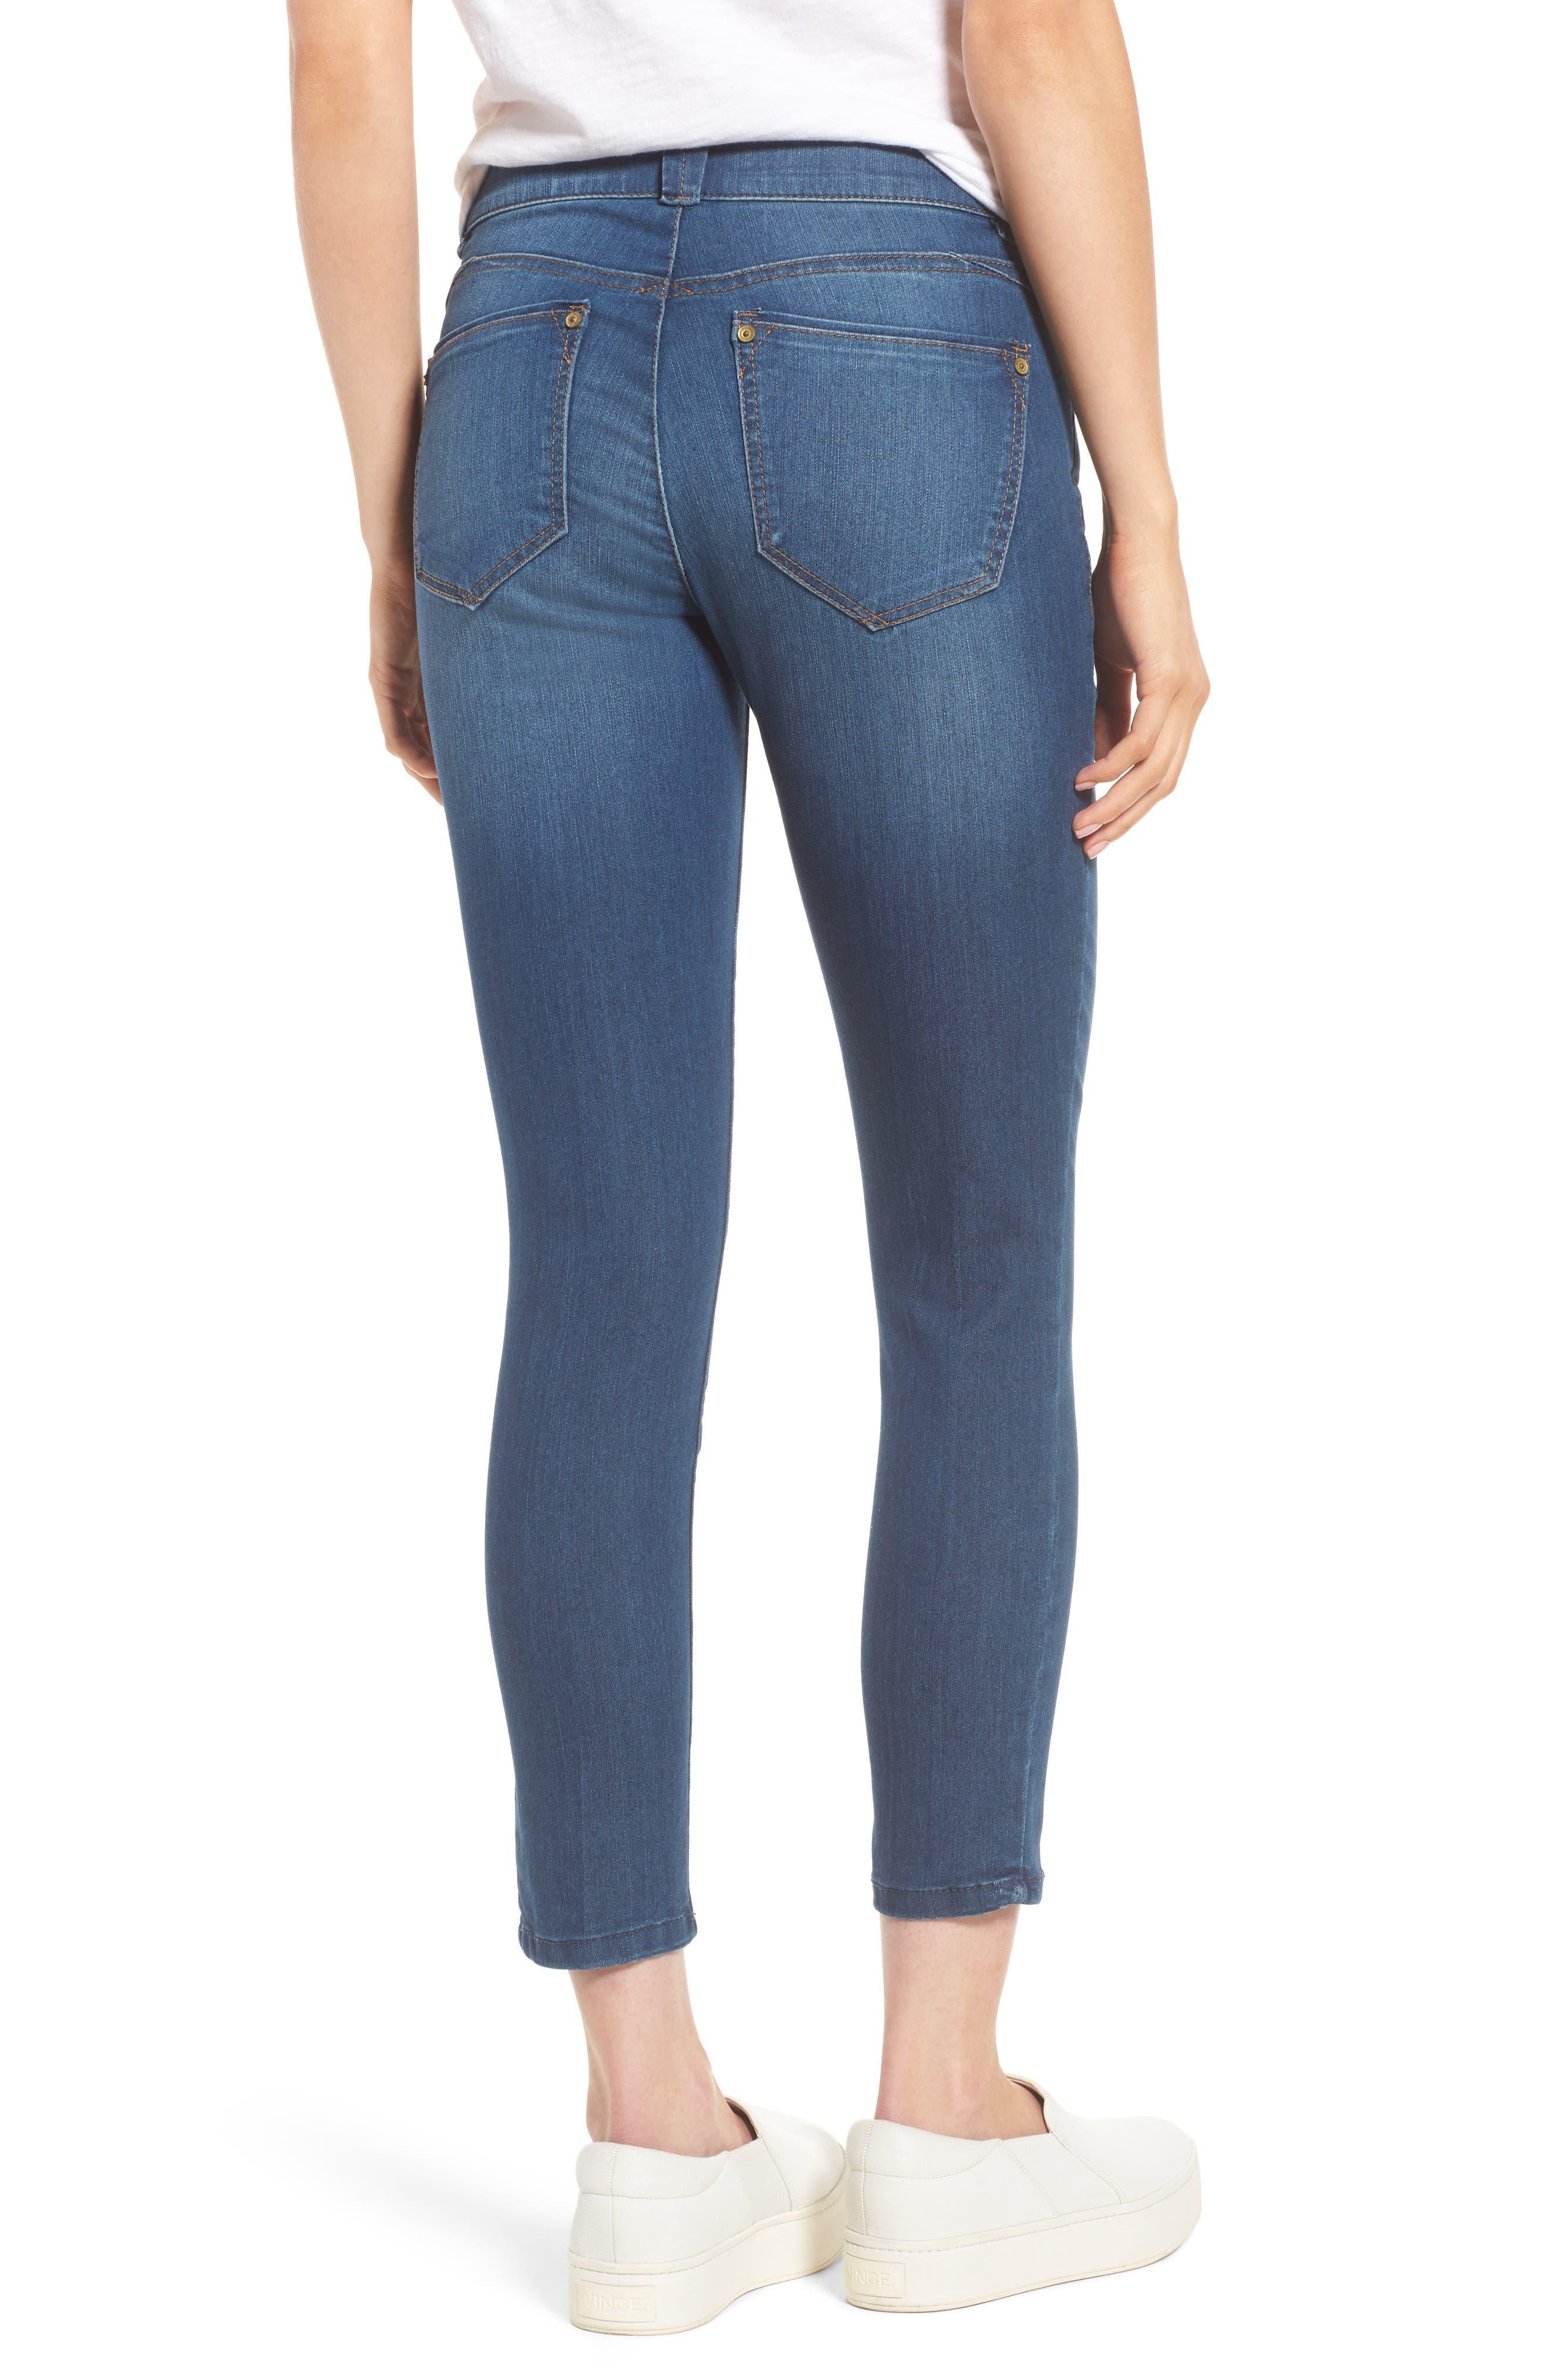 Alternate Image 2  - Wit & Wisdom Ab-solution Ankle Skimmer Jeans (Nordstrom Exclusive)